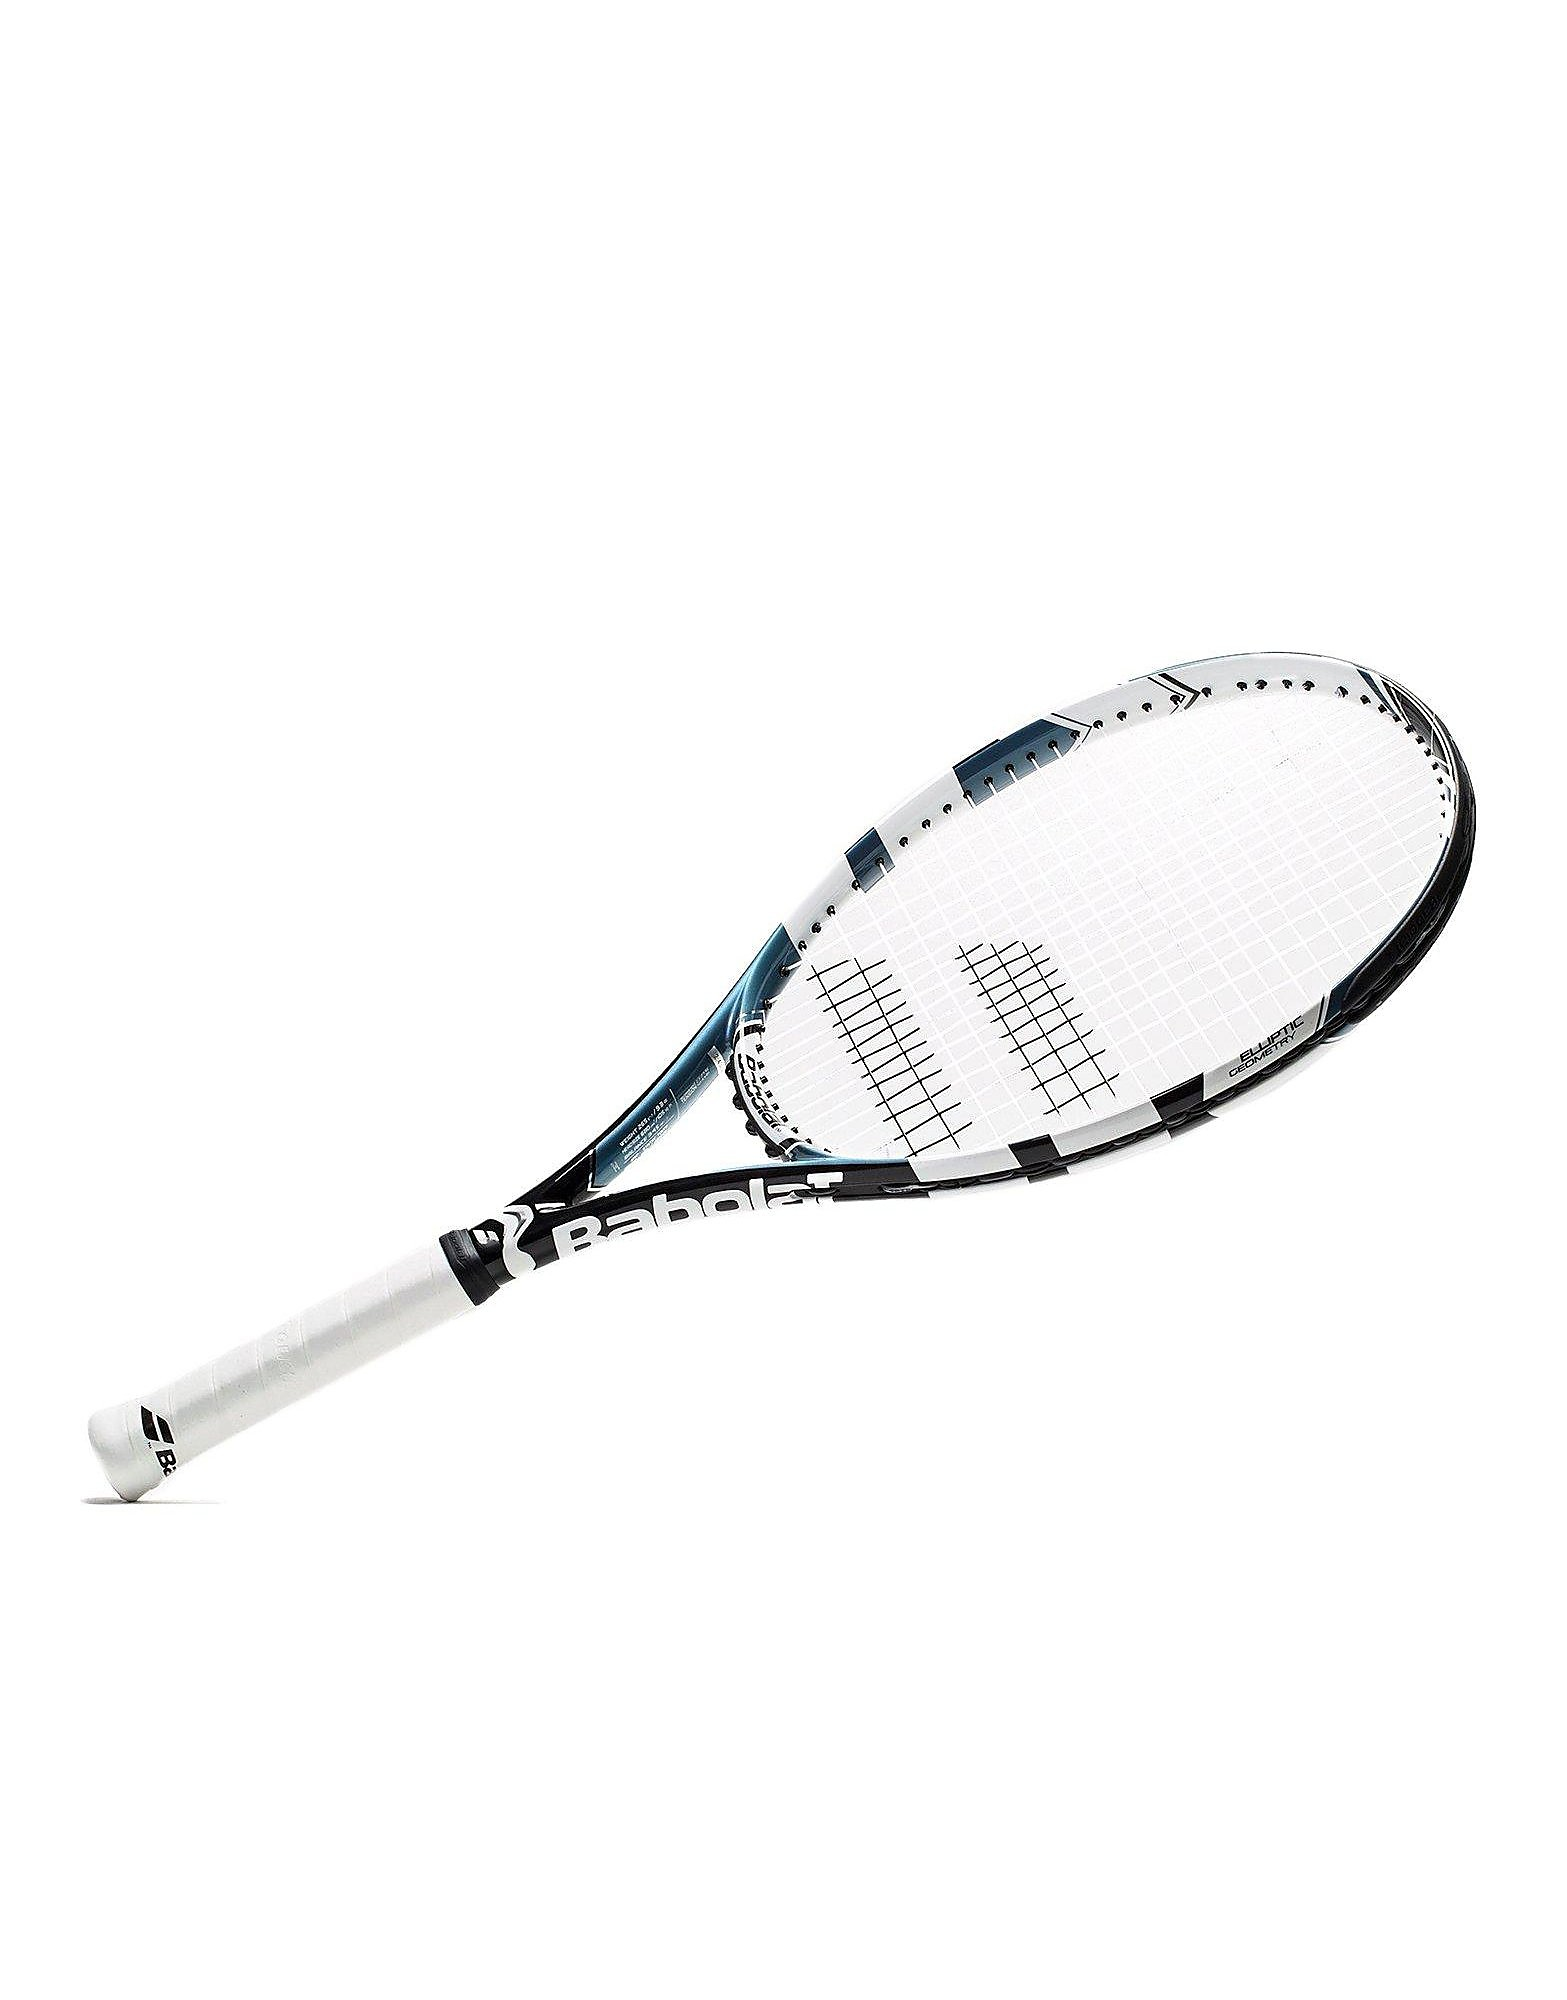 Babolat Drive 105 Strung Tennis Racket